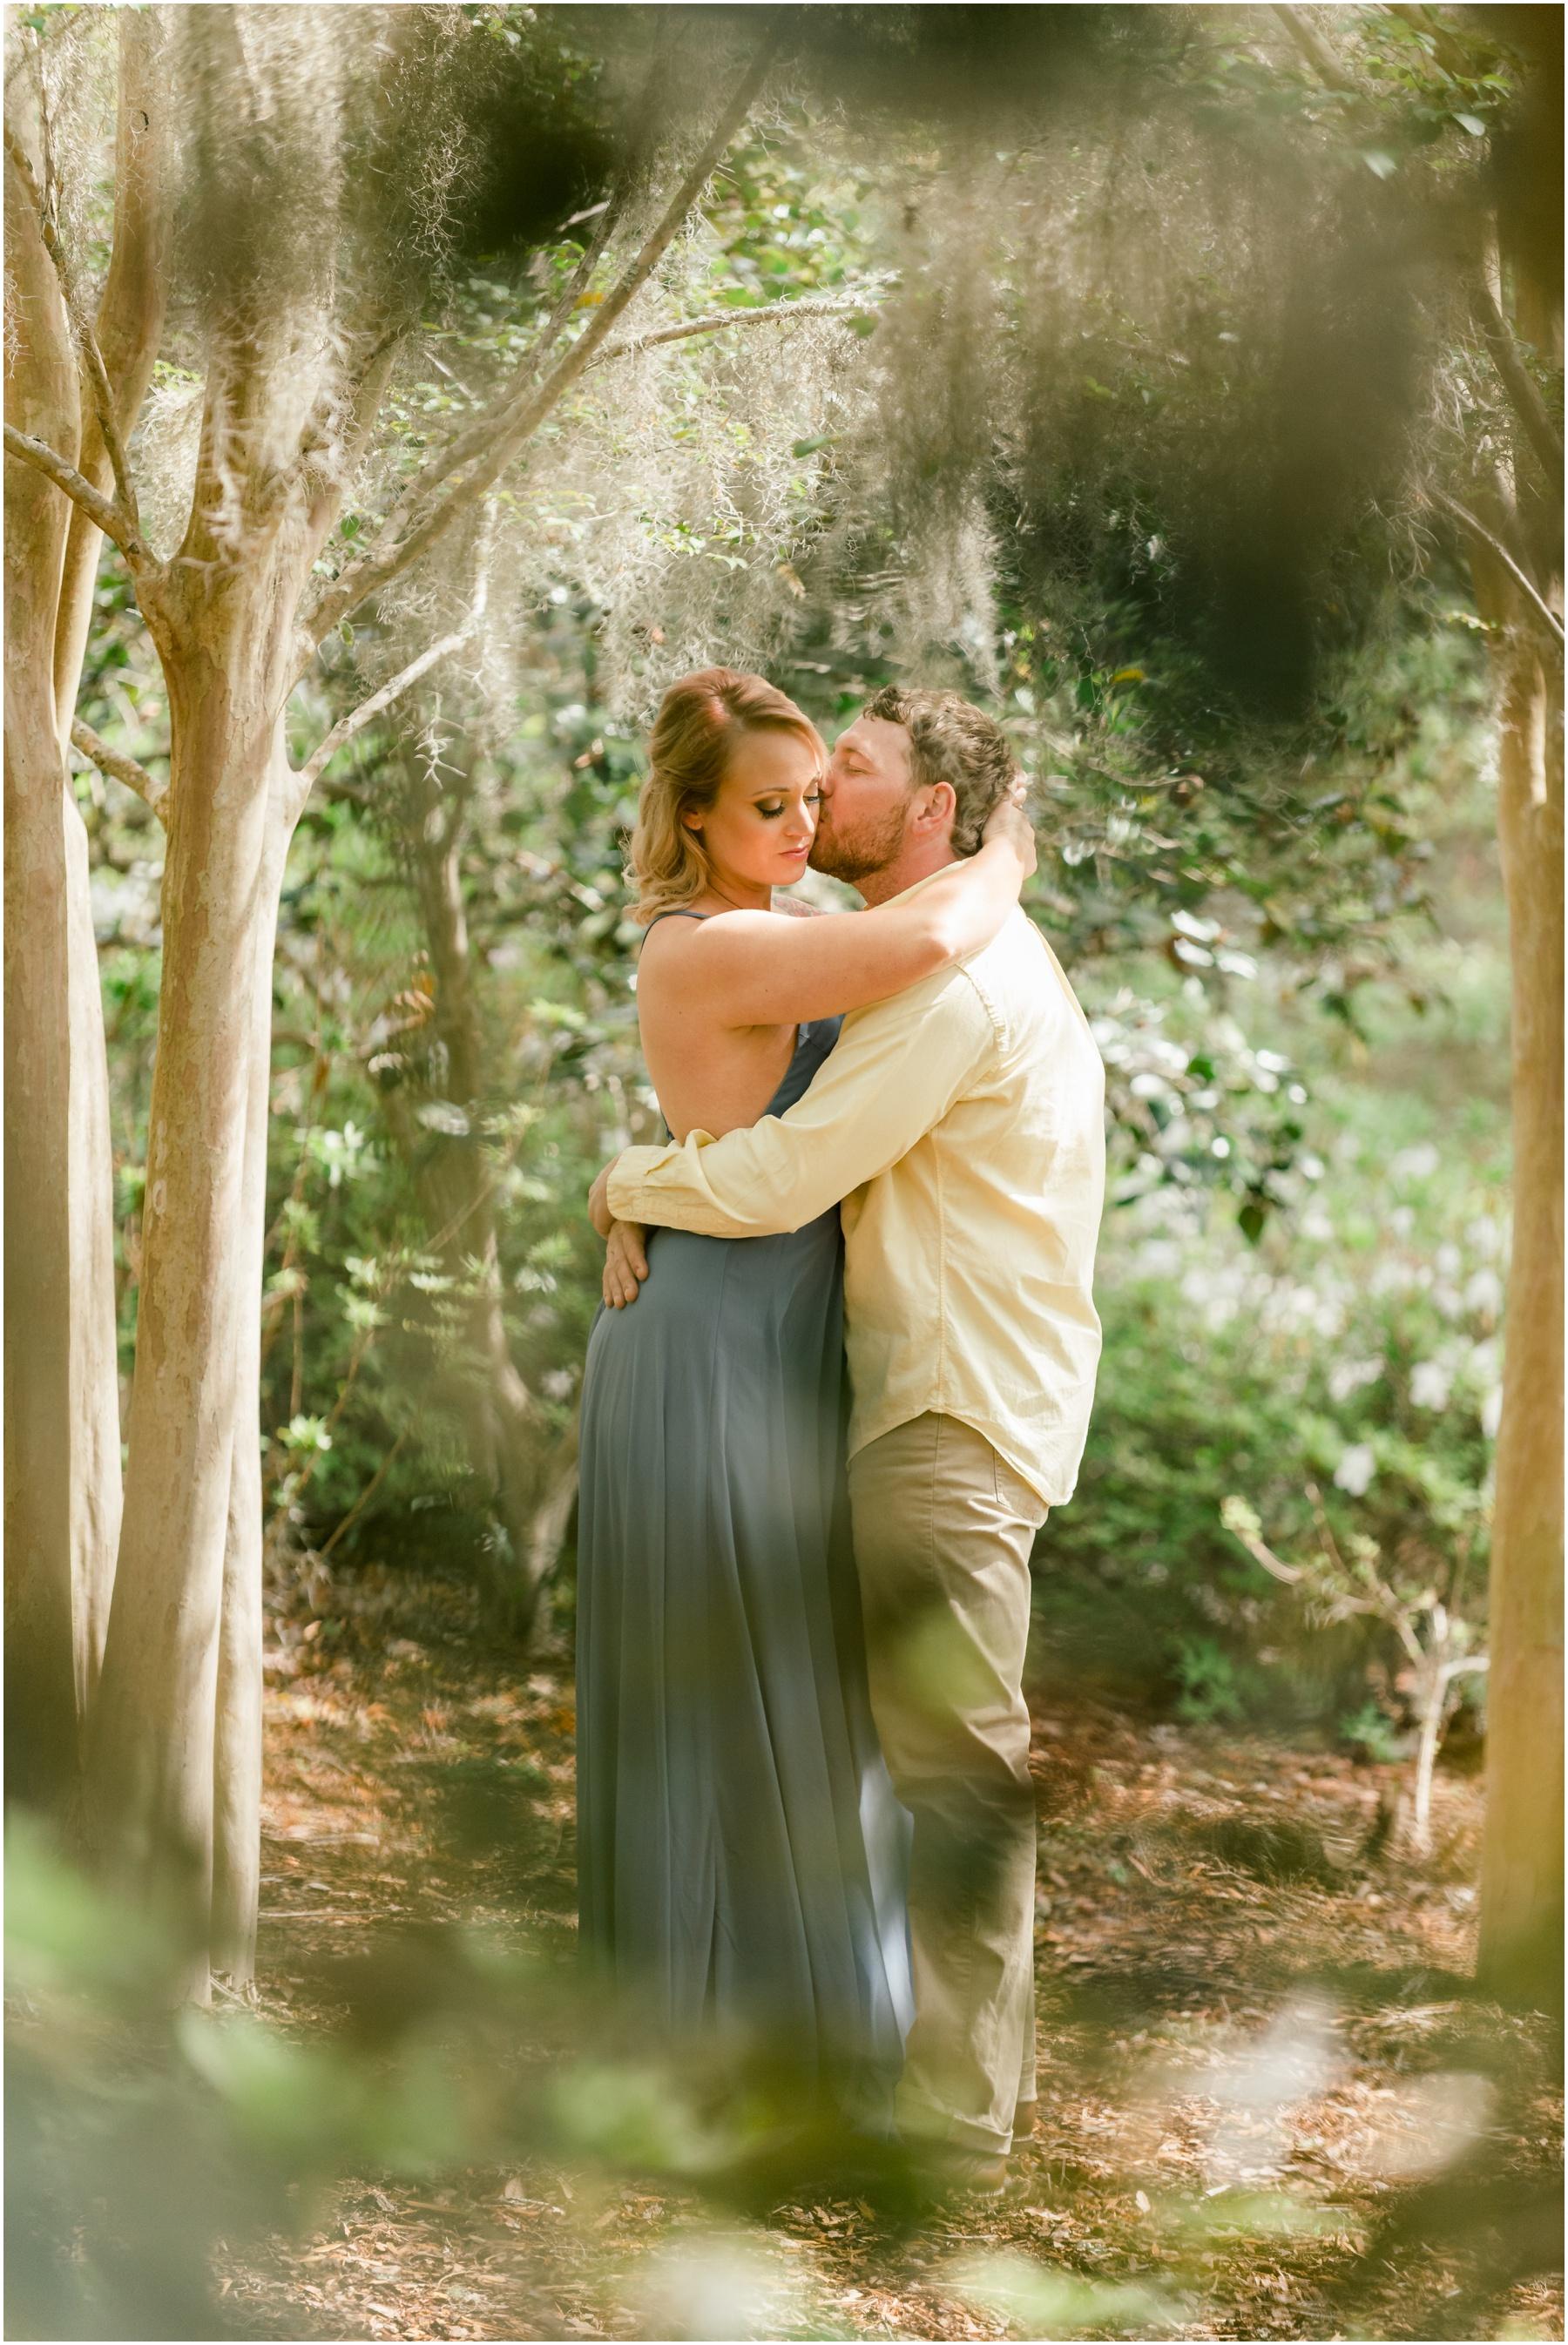 Mepkin-Abbey-Moncks-Corner-South-Carolina-Engagement-Session-Photos_0005.jpg